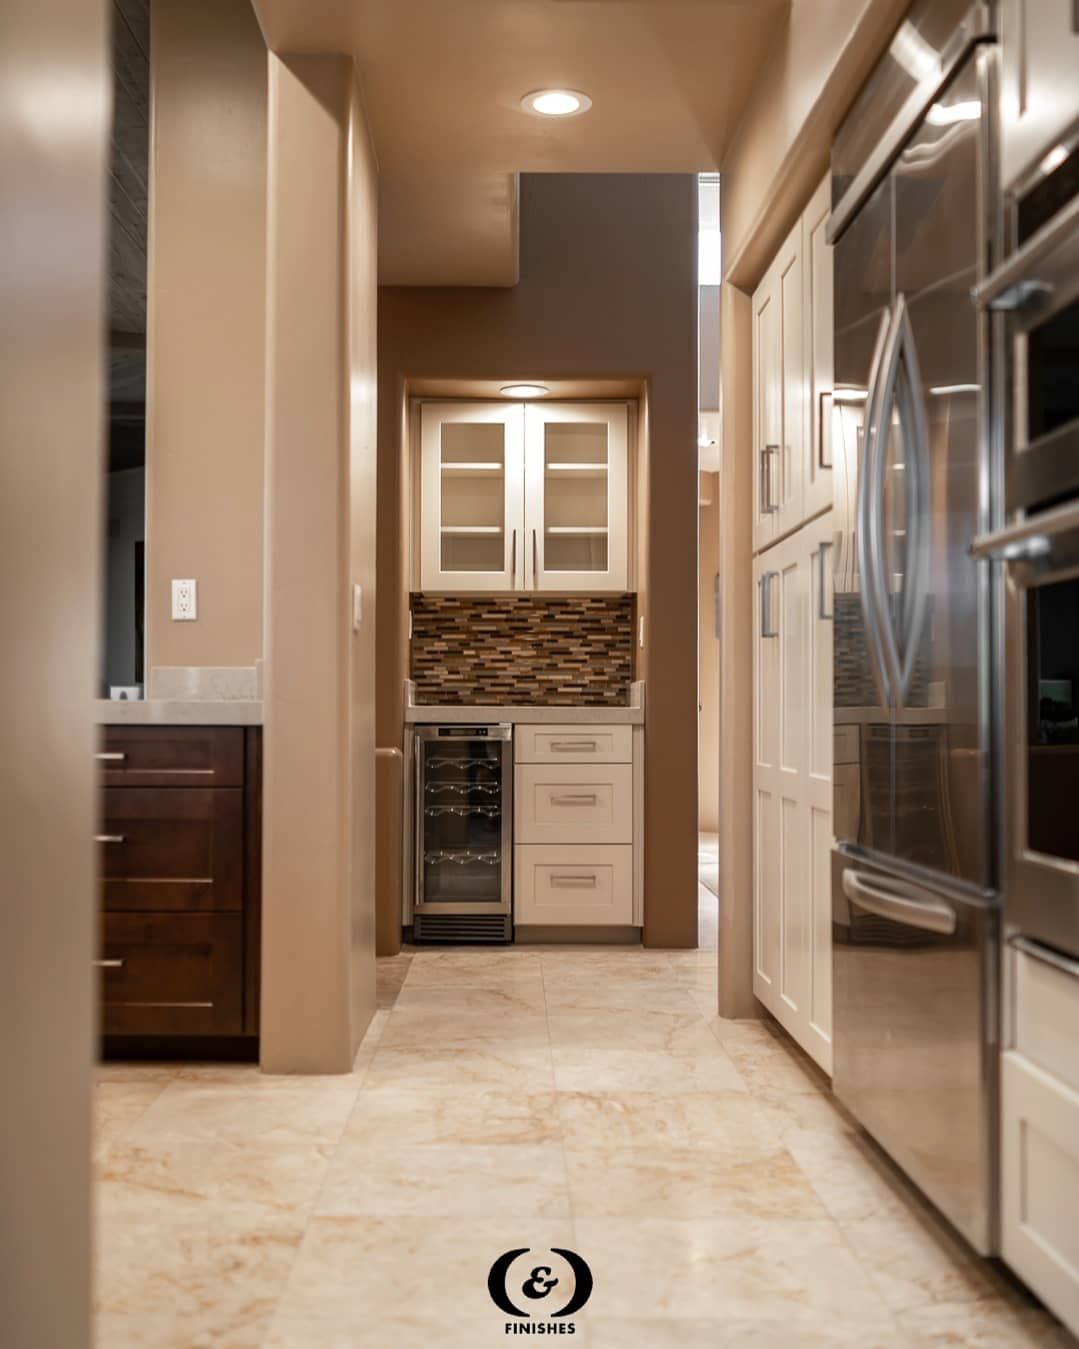 Hunt S Kitchen Design In 2020 Custom Kitchens Design Kitchen Design Showrooms Kitchen Trends